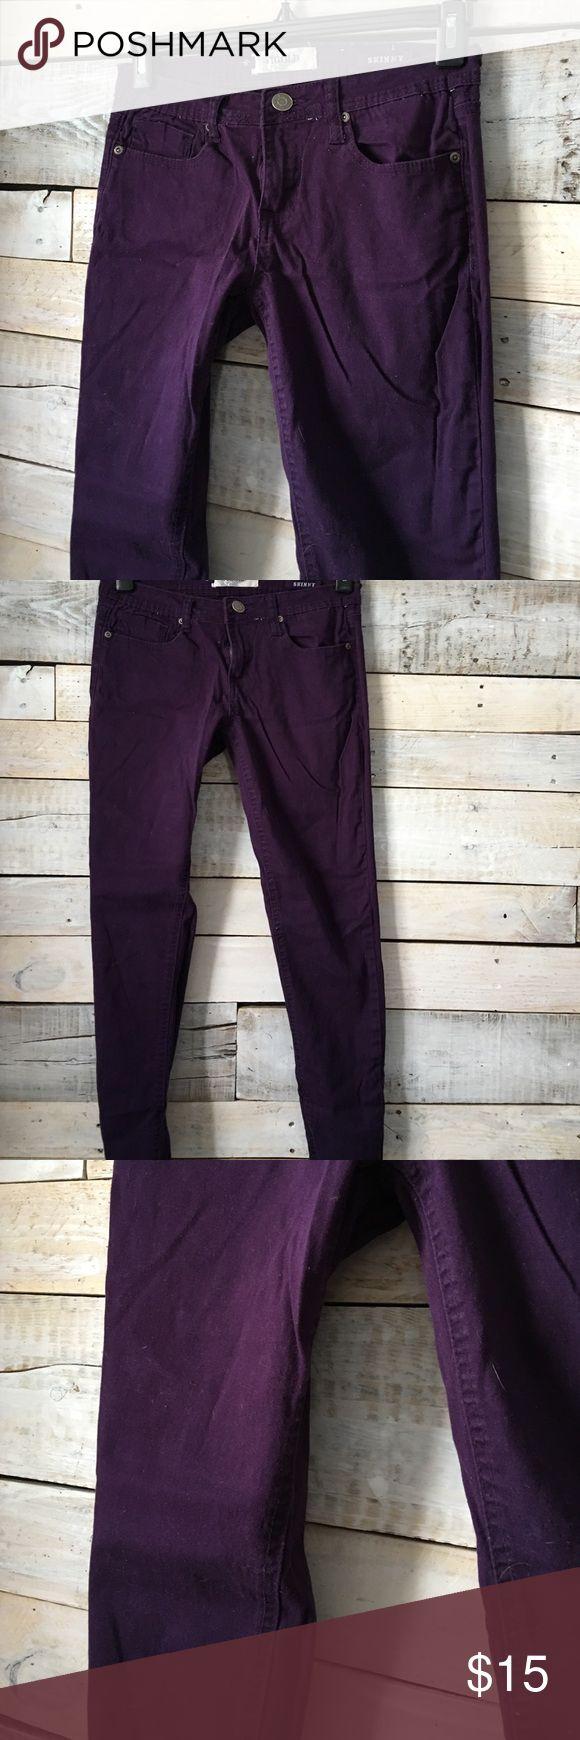 Purple skinny jeans Purple skinny jeans Jeans Skinny